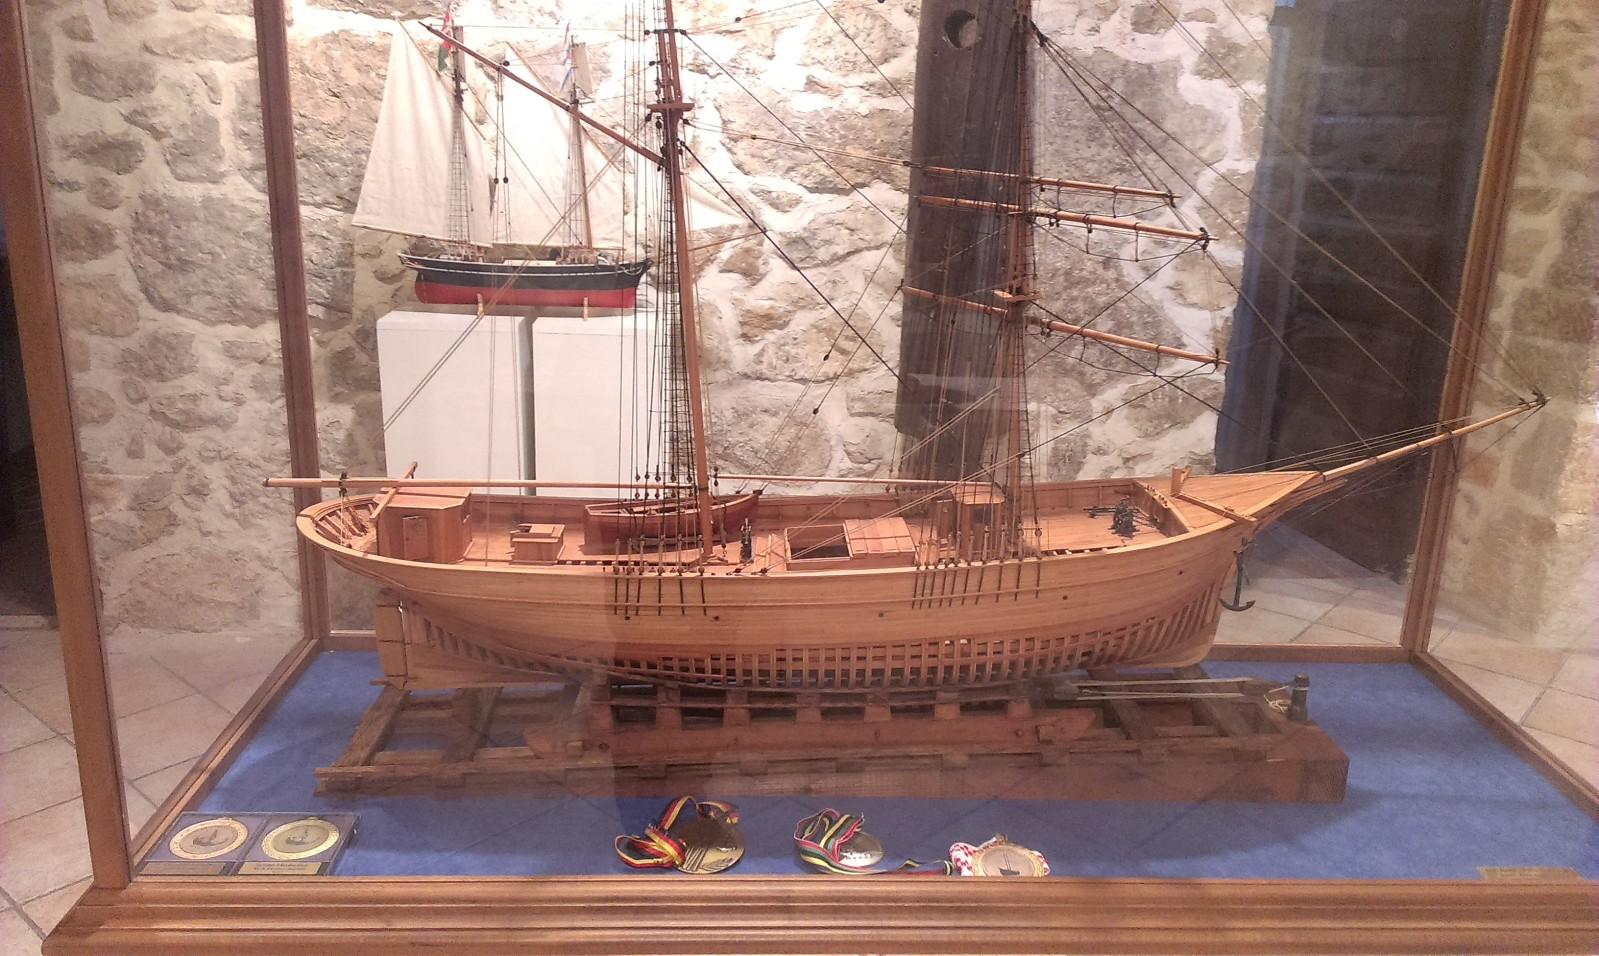 Izložba maketa brodova Vgooyb